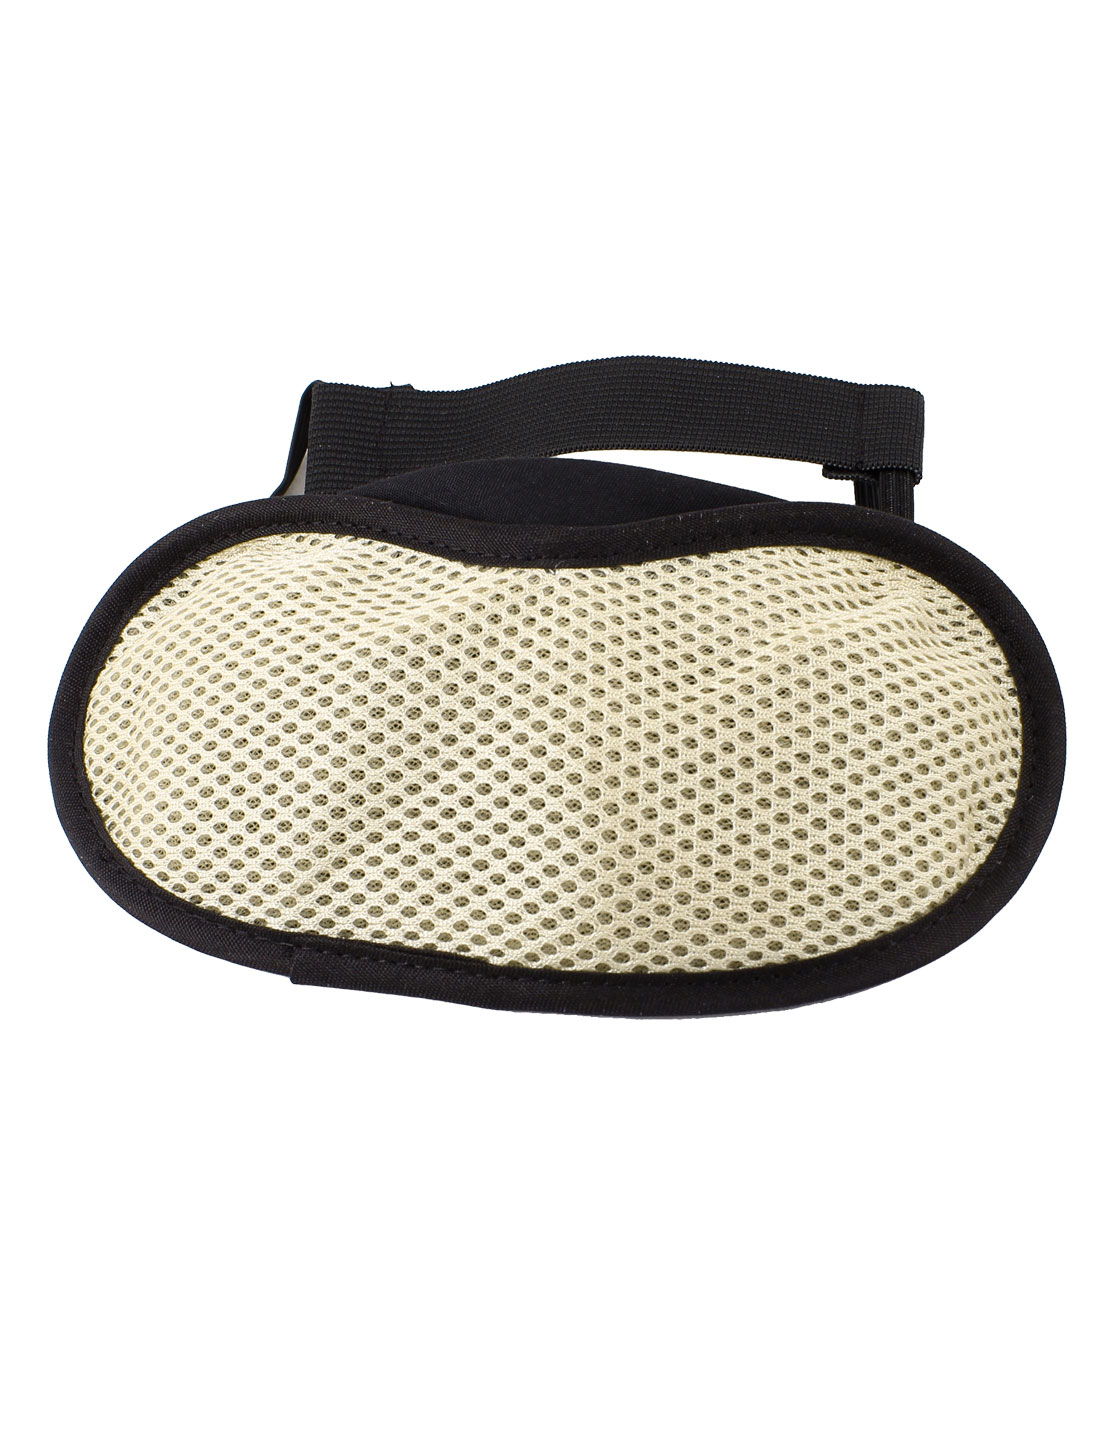 Beige Black Meshy Surface Double Stretchy Strap Eye Mask Eyeshade Sleep Cover